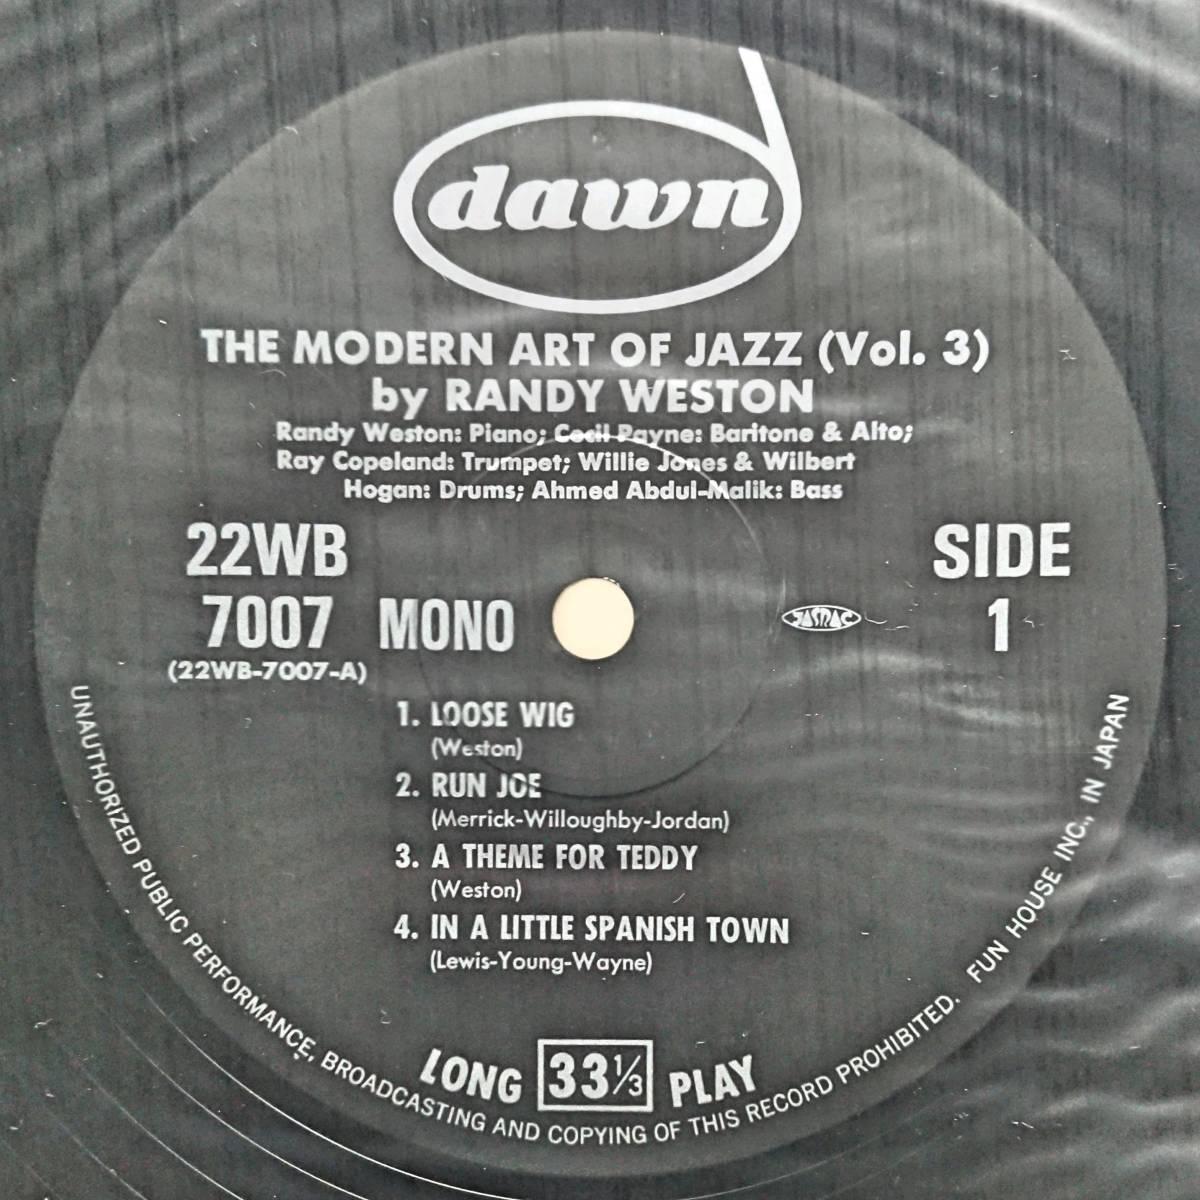 Randy Weston(p)/The Modern Art Of Jazz Vol.3 ランディ・ウエストン(p)/モダン・アート・オブ・ジャズ Vol.3【国内帯付重量盤美盤】_画像7